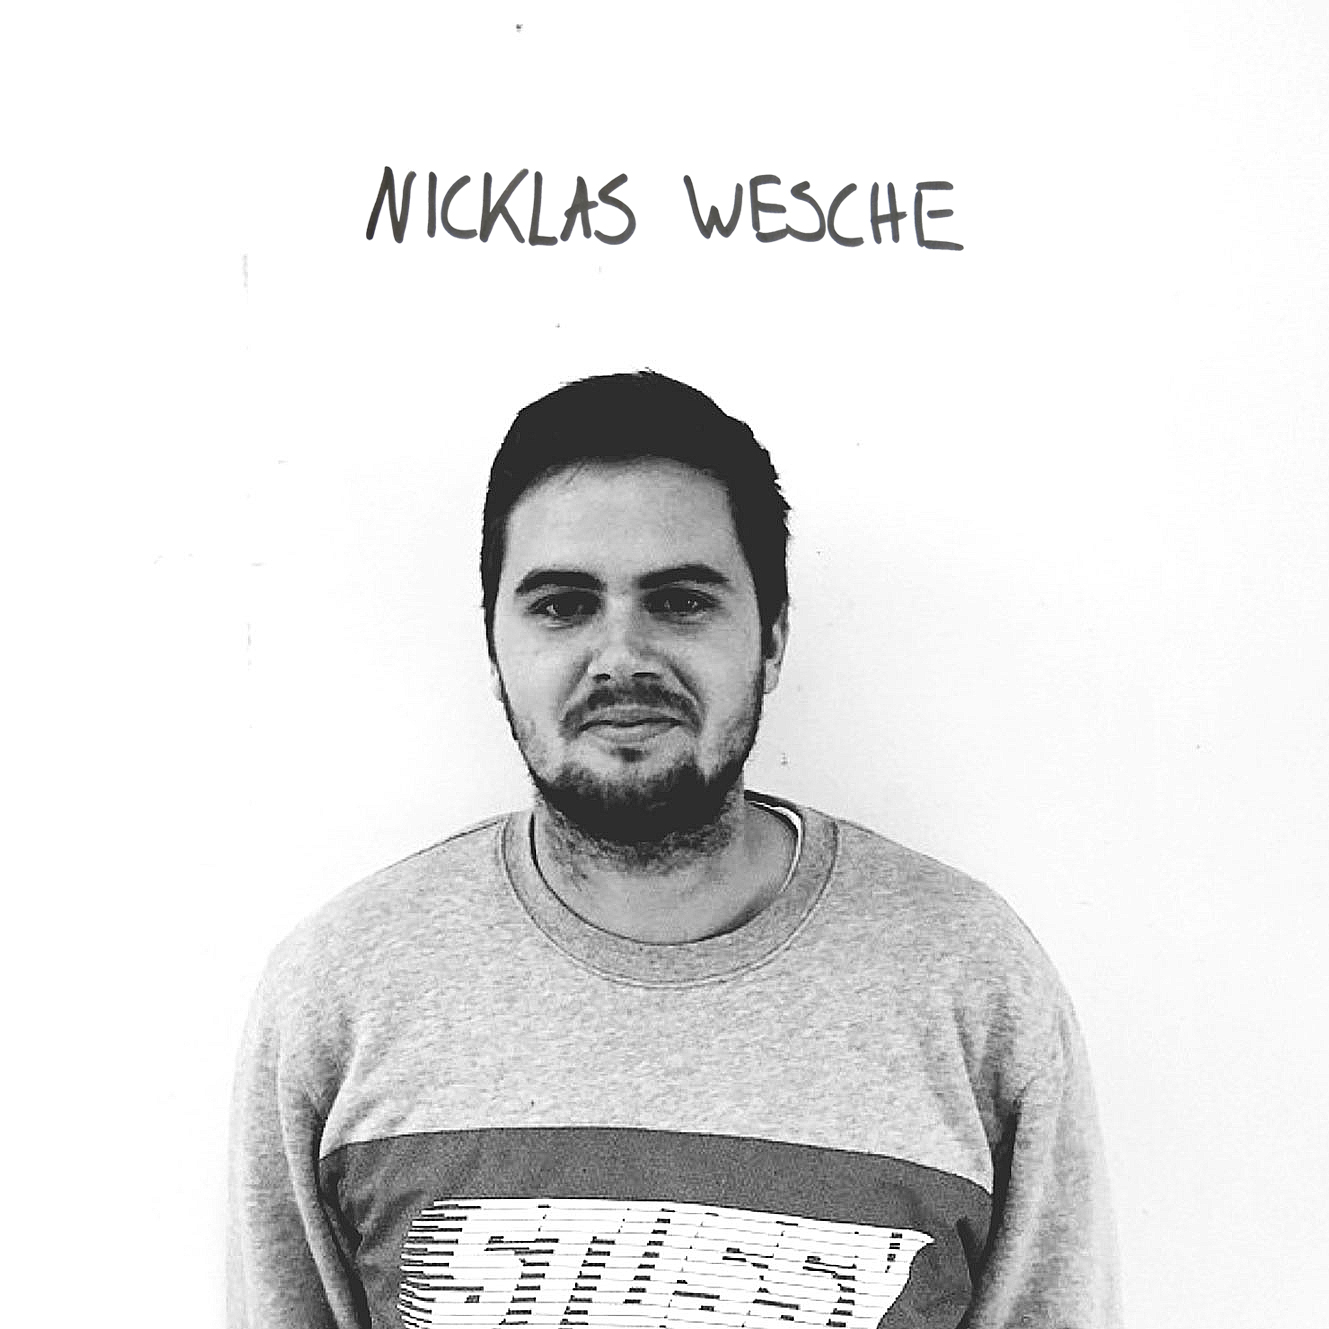 NICKLAS WESCHE